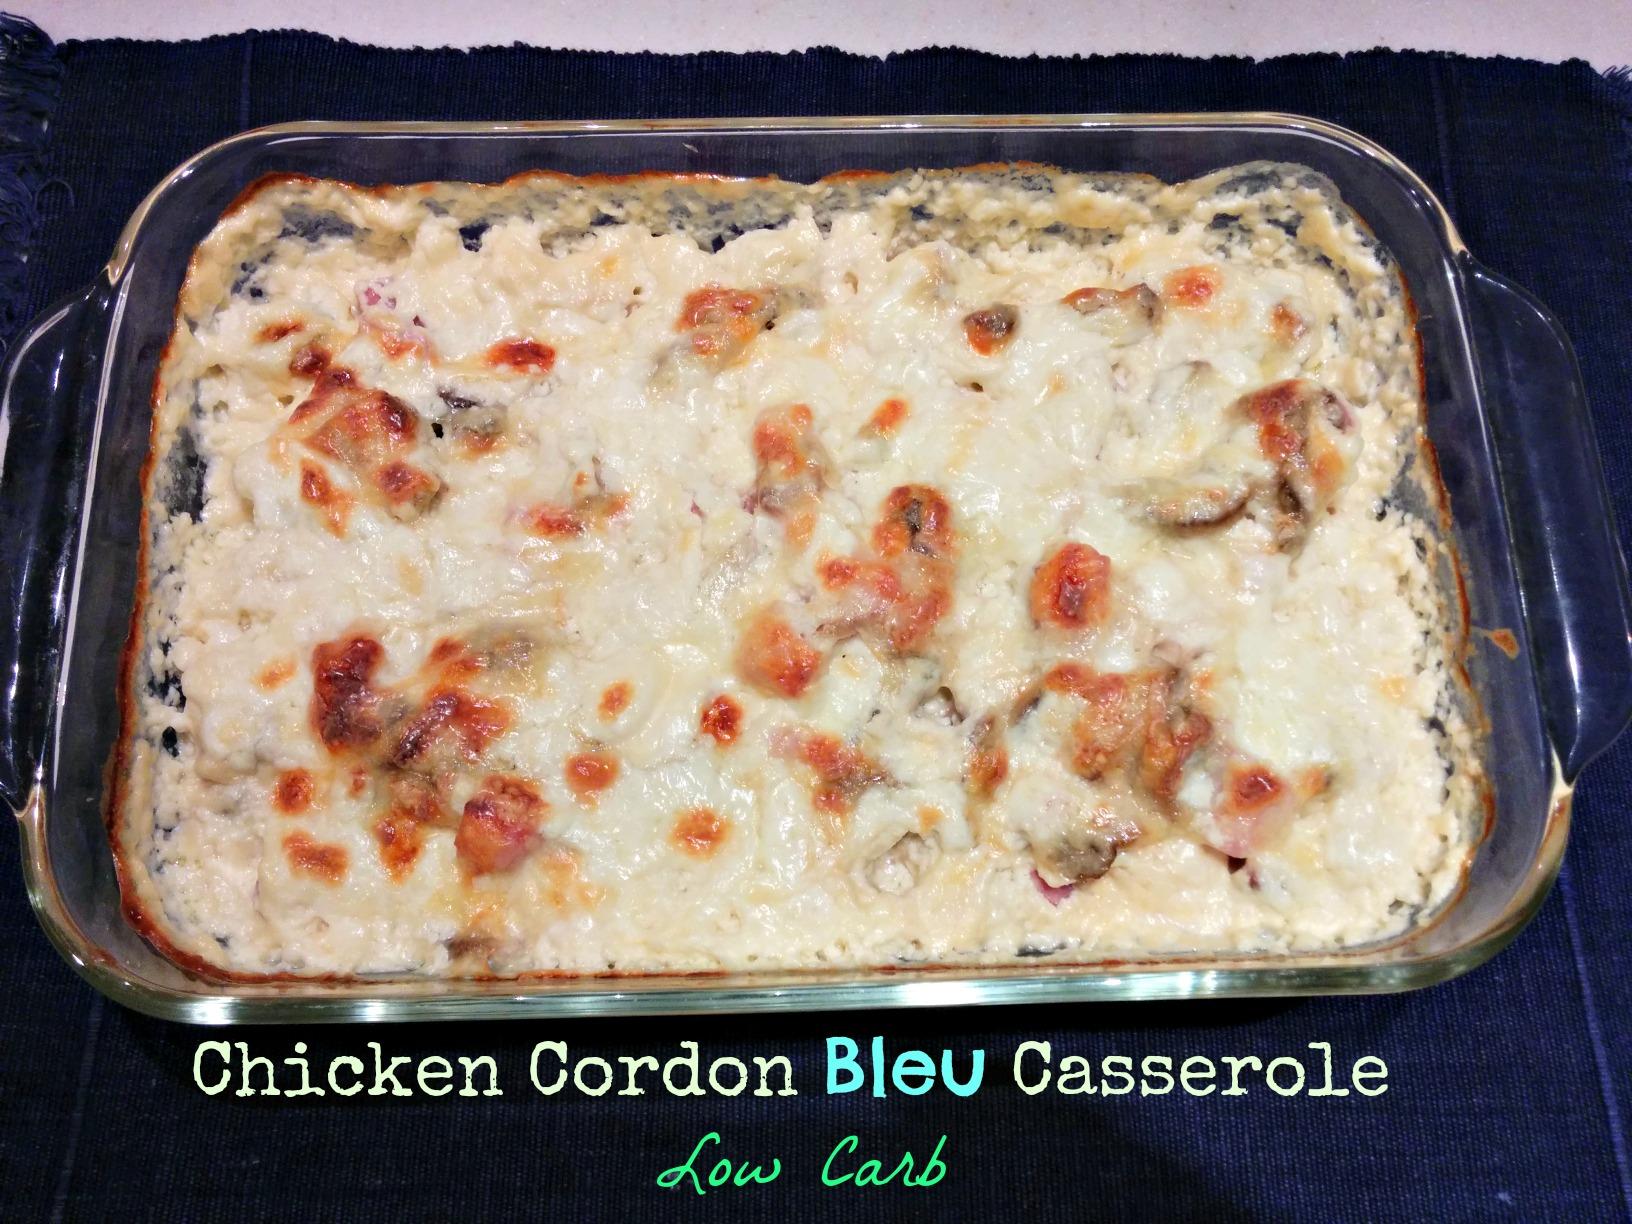 Chicken Cordon Bleu Casserole – Low Carb | The Chocolate Bottle